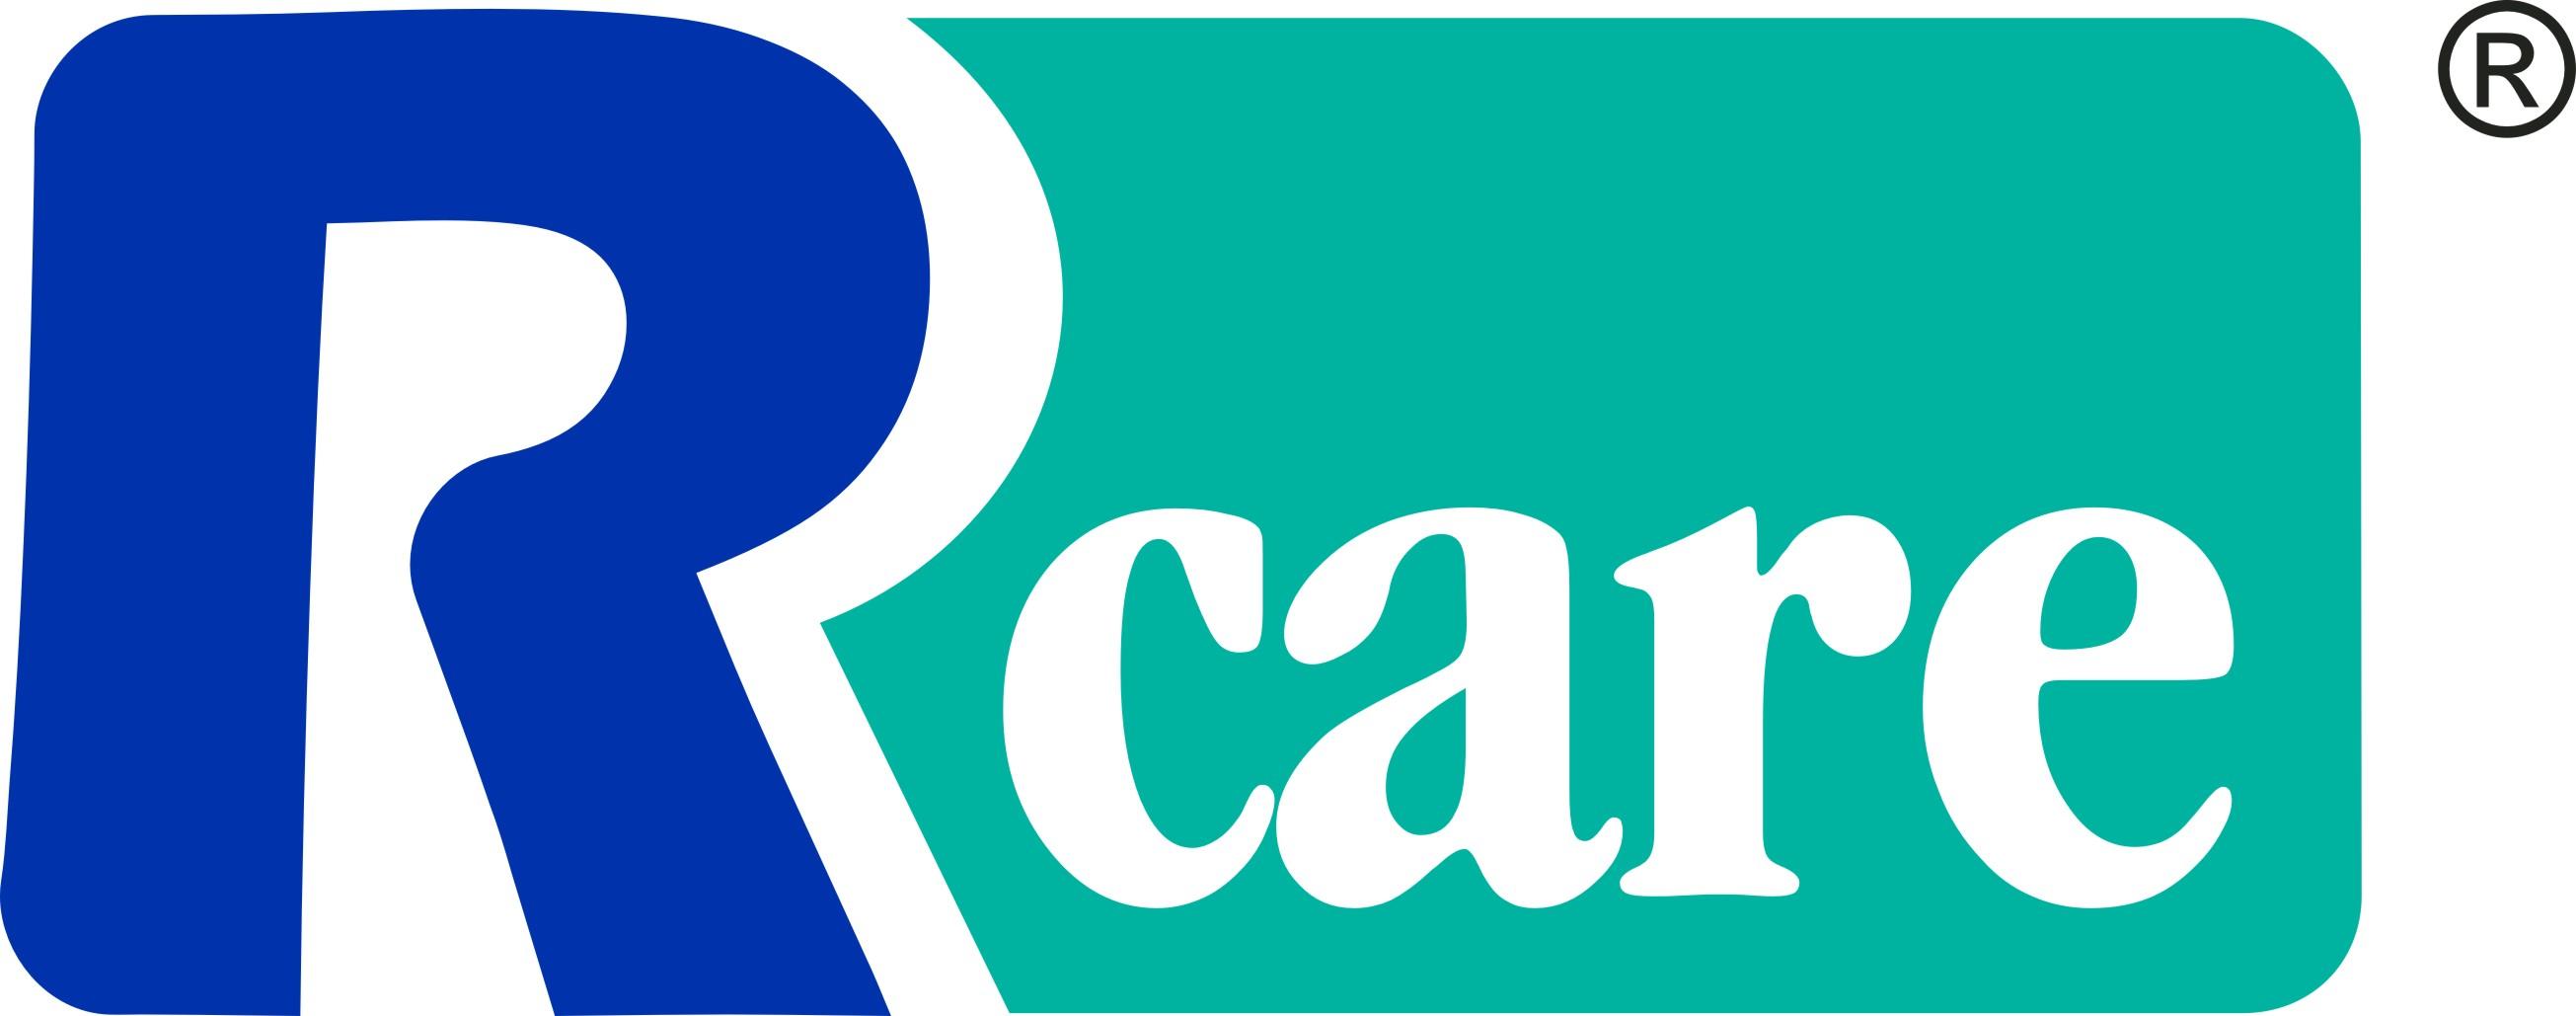 Response Care Inc's